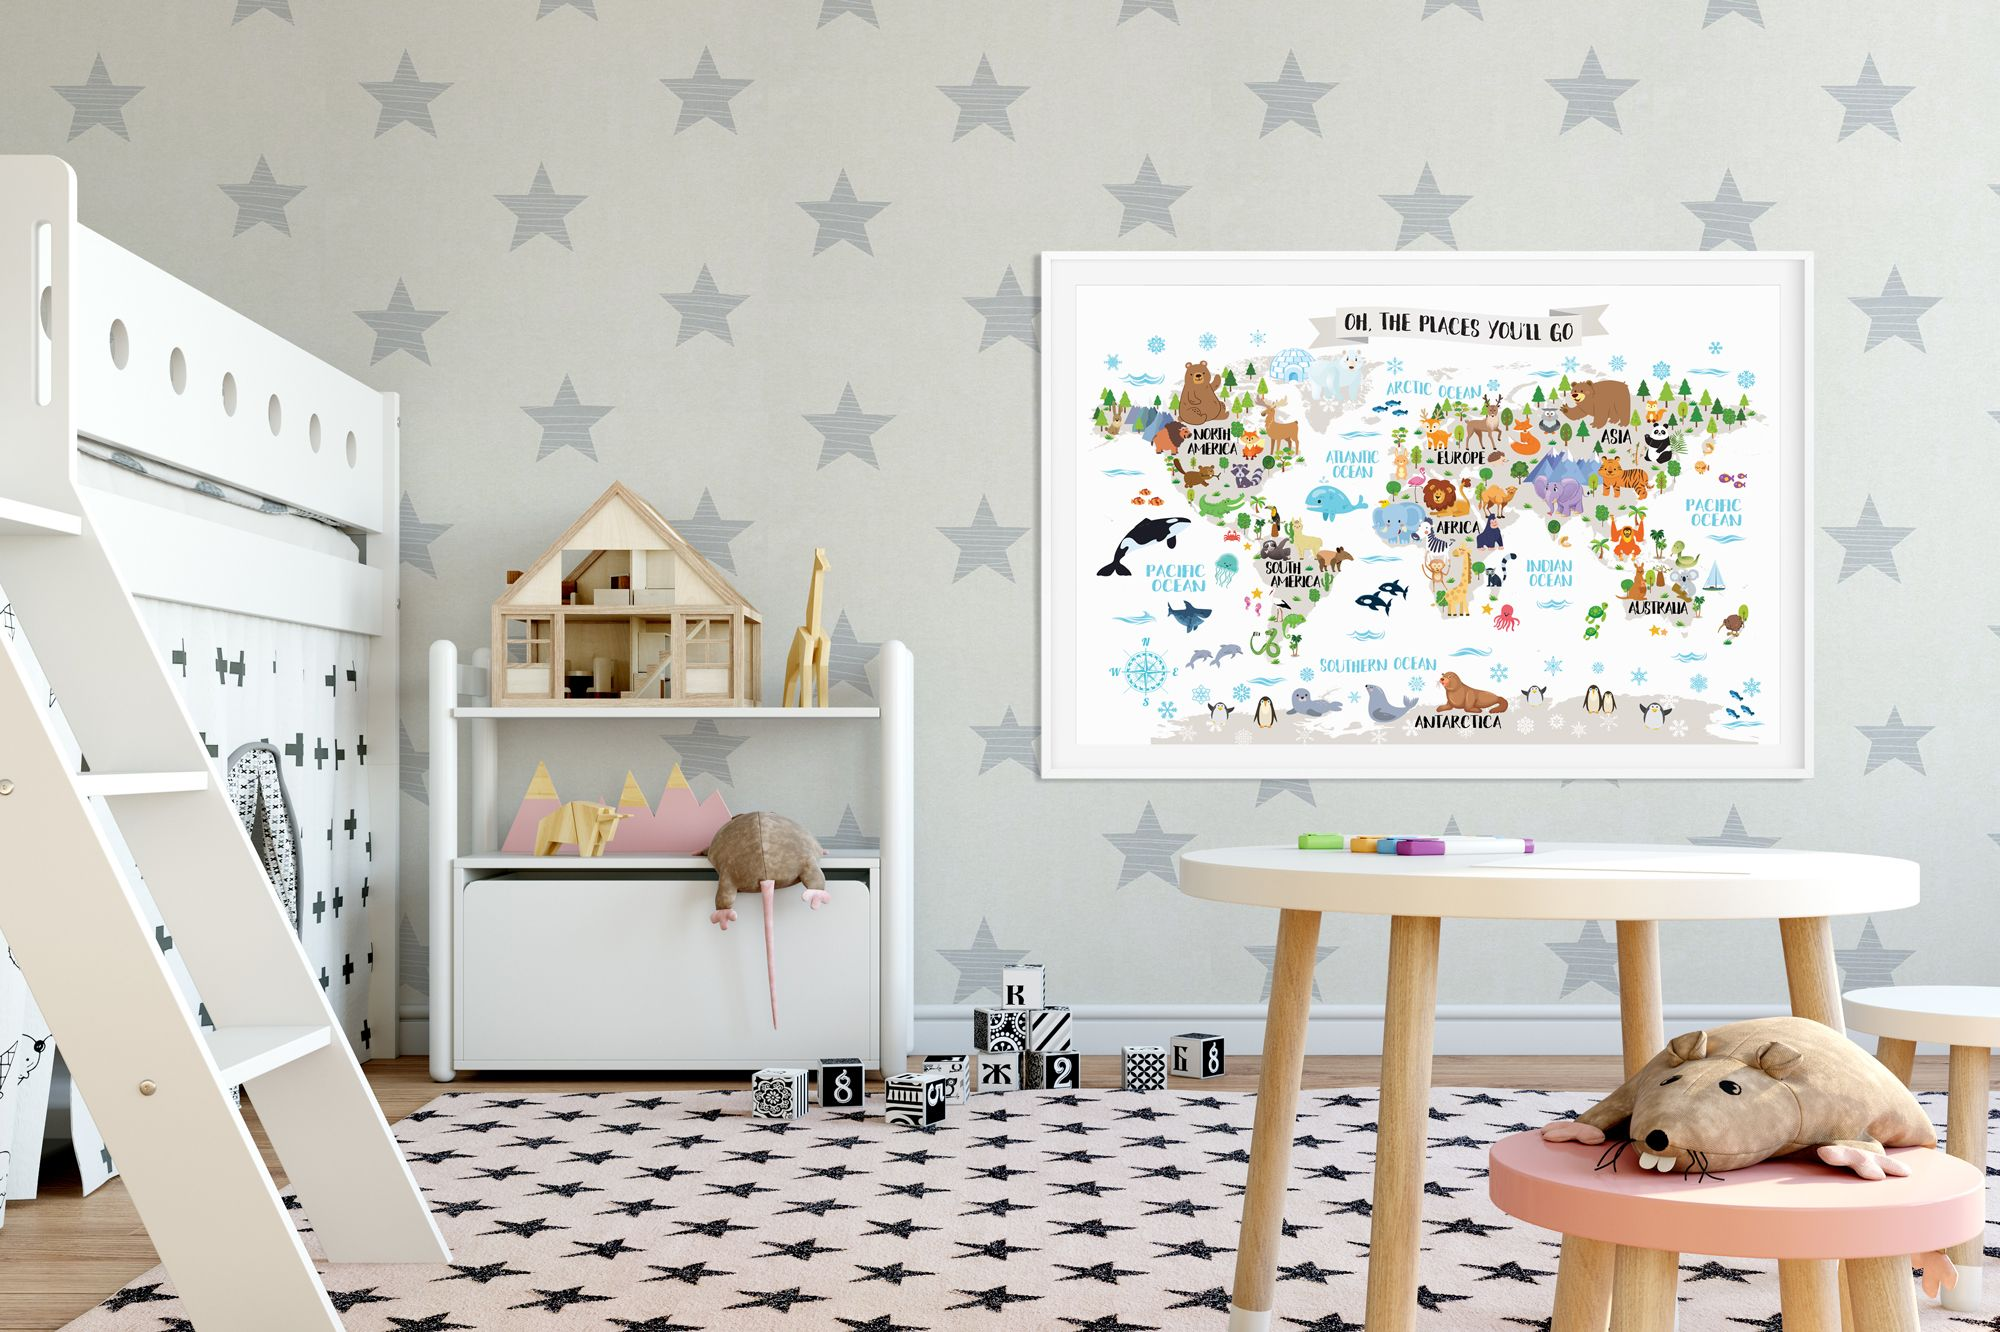 Kids world map poster Animal world map Playroom wall decor Kids room on keystone world map, large world map, hack world map, 2 color world map, auburn world map, pillars world map, bending world map, lafayette world map, dover world map, highlands world map, repositionable world map, weathered world map, angle world map, go to the world map, old world map, eden world map, johnson world map, girl world map, thompson world map, ridges world map,